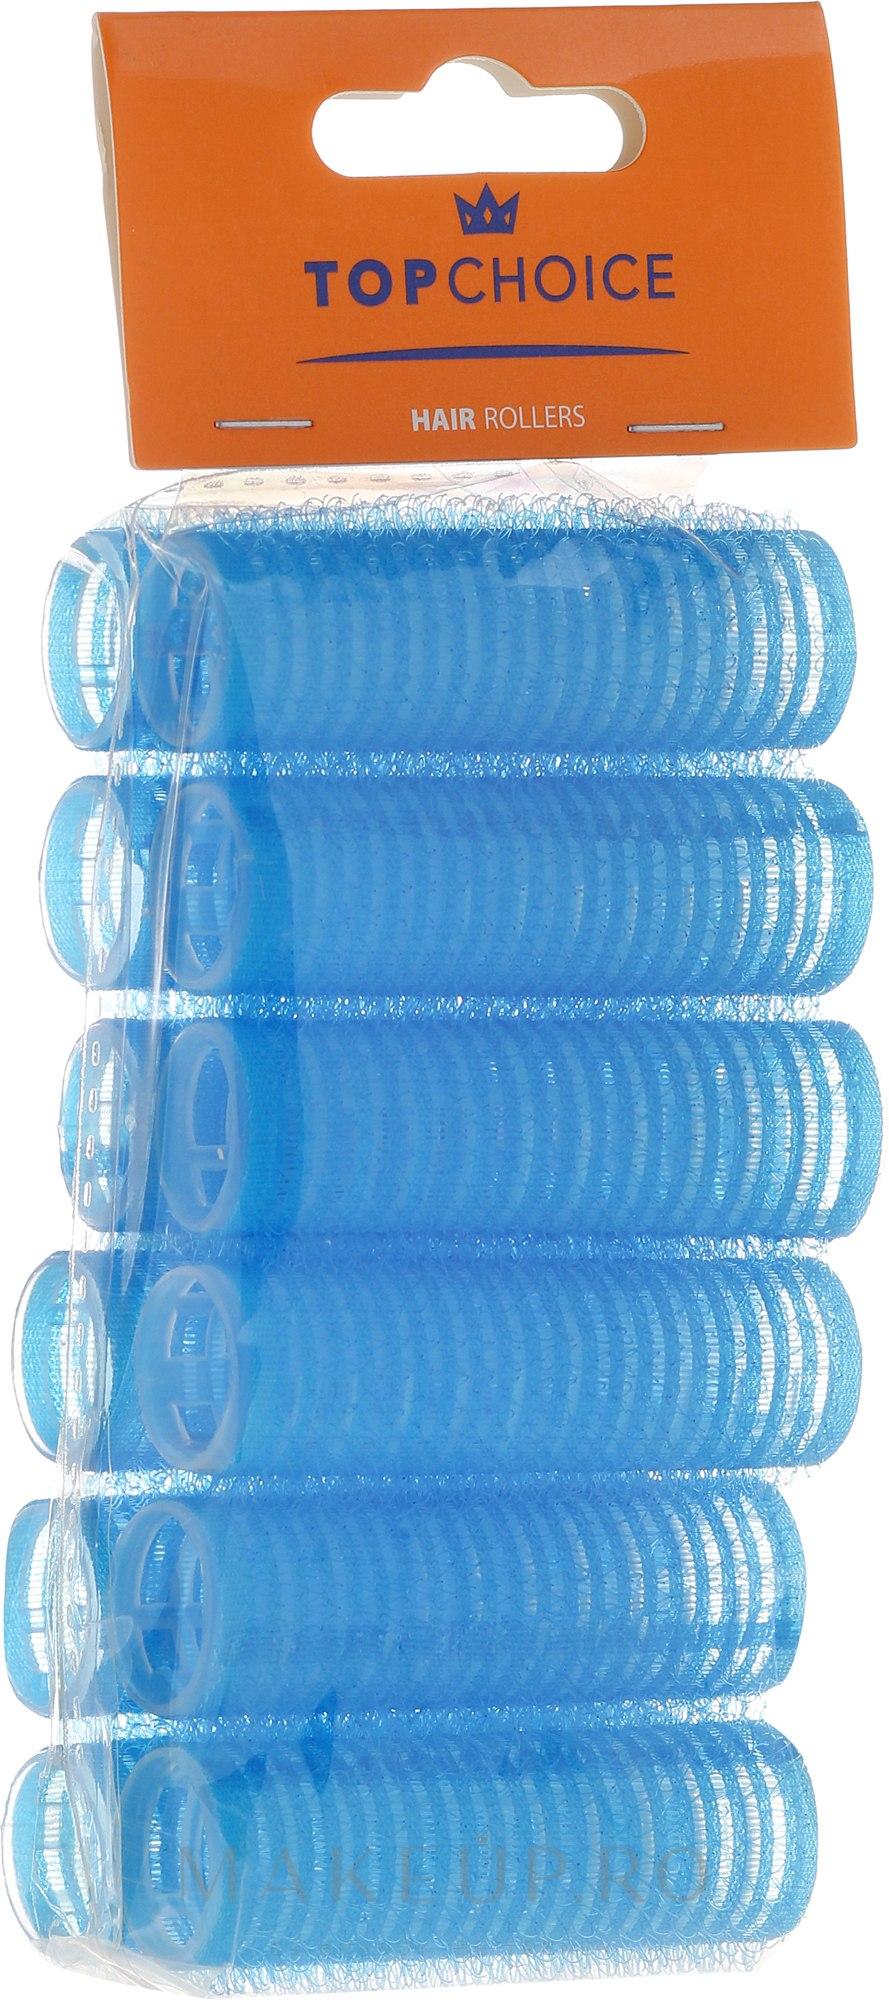 "Bigudiuri ""Velcro"" 18 mm, 12 buc., 0188 - Top Choice — Imagine 12 buc"